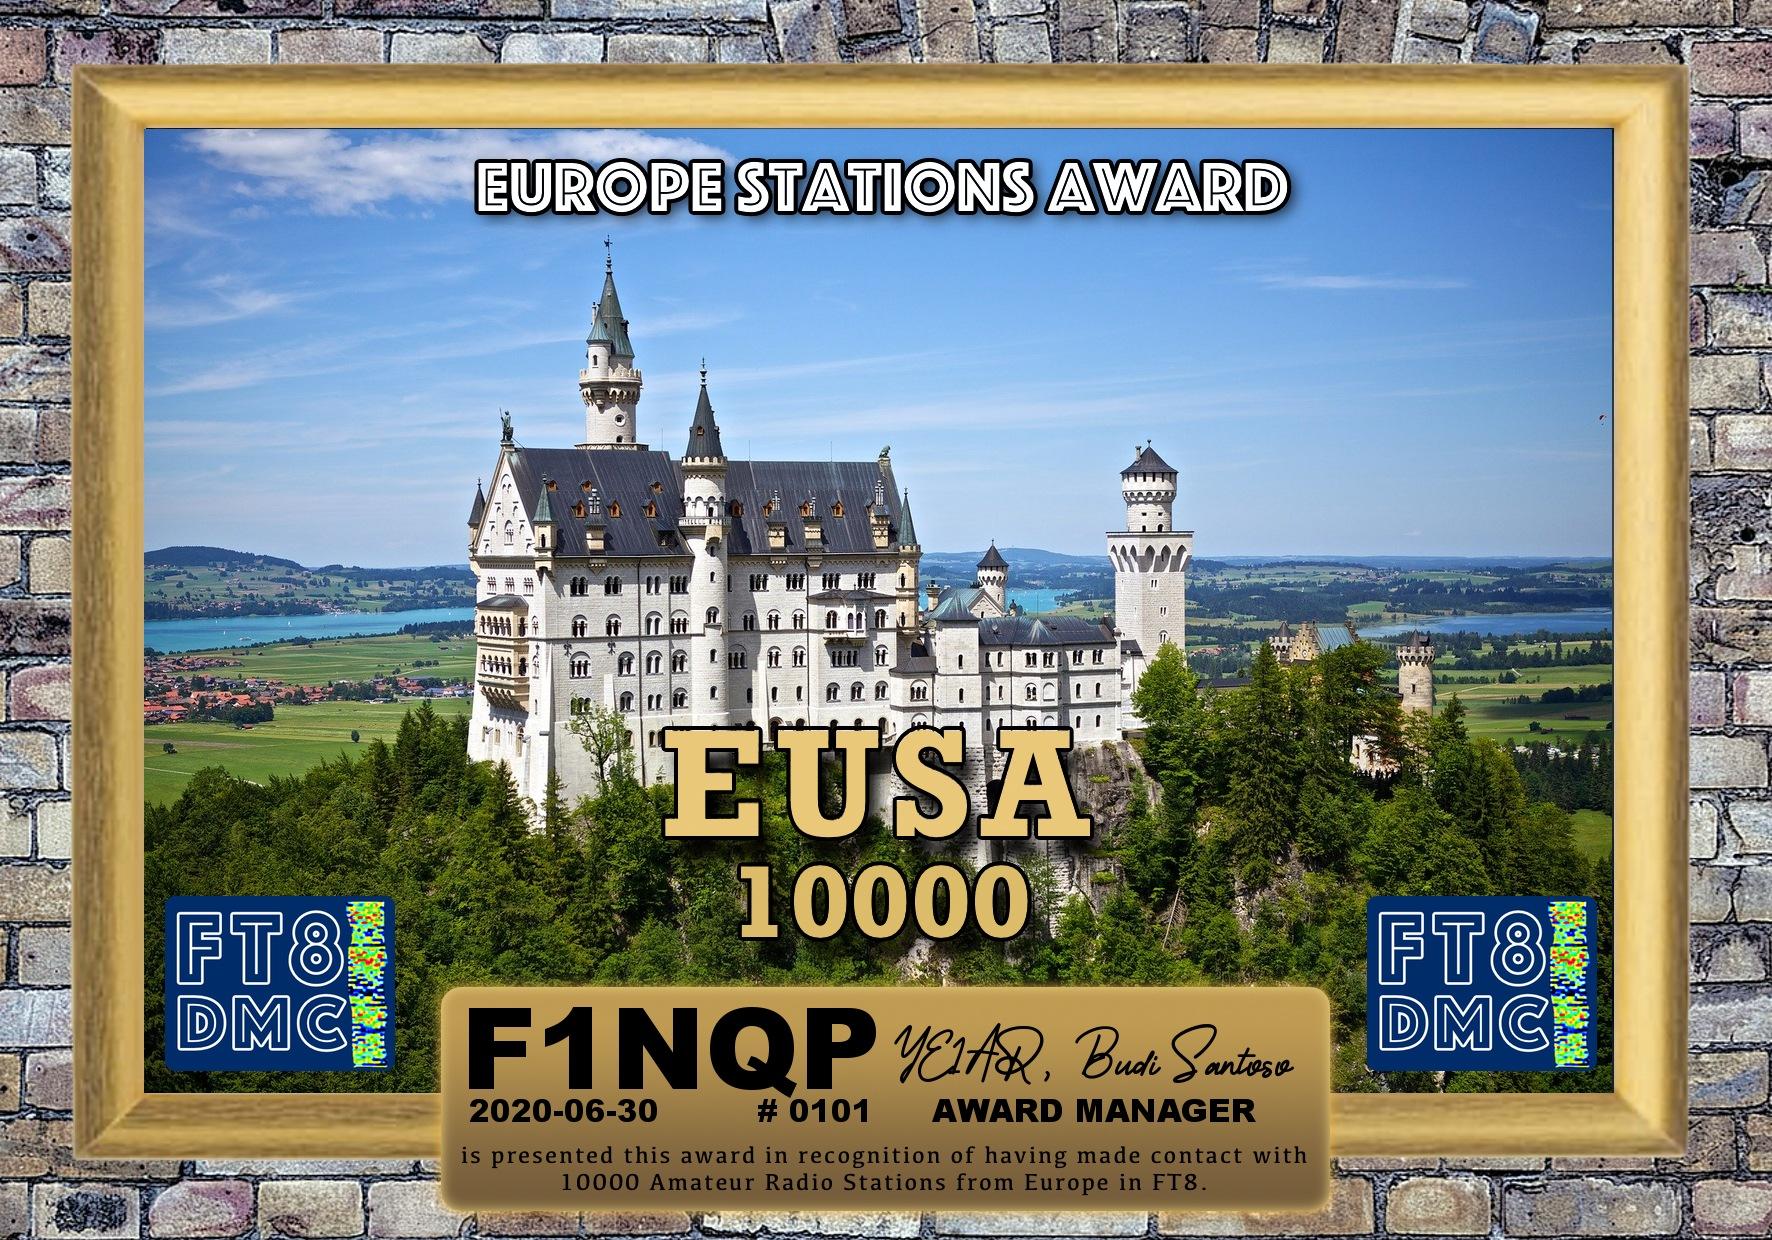 F1NQP-EUSA-10000_FT8DMC.jpg